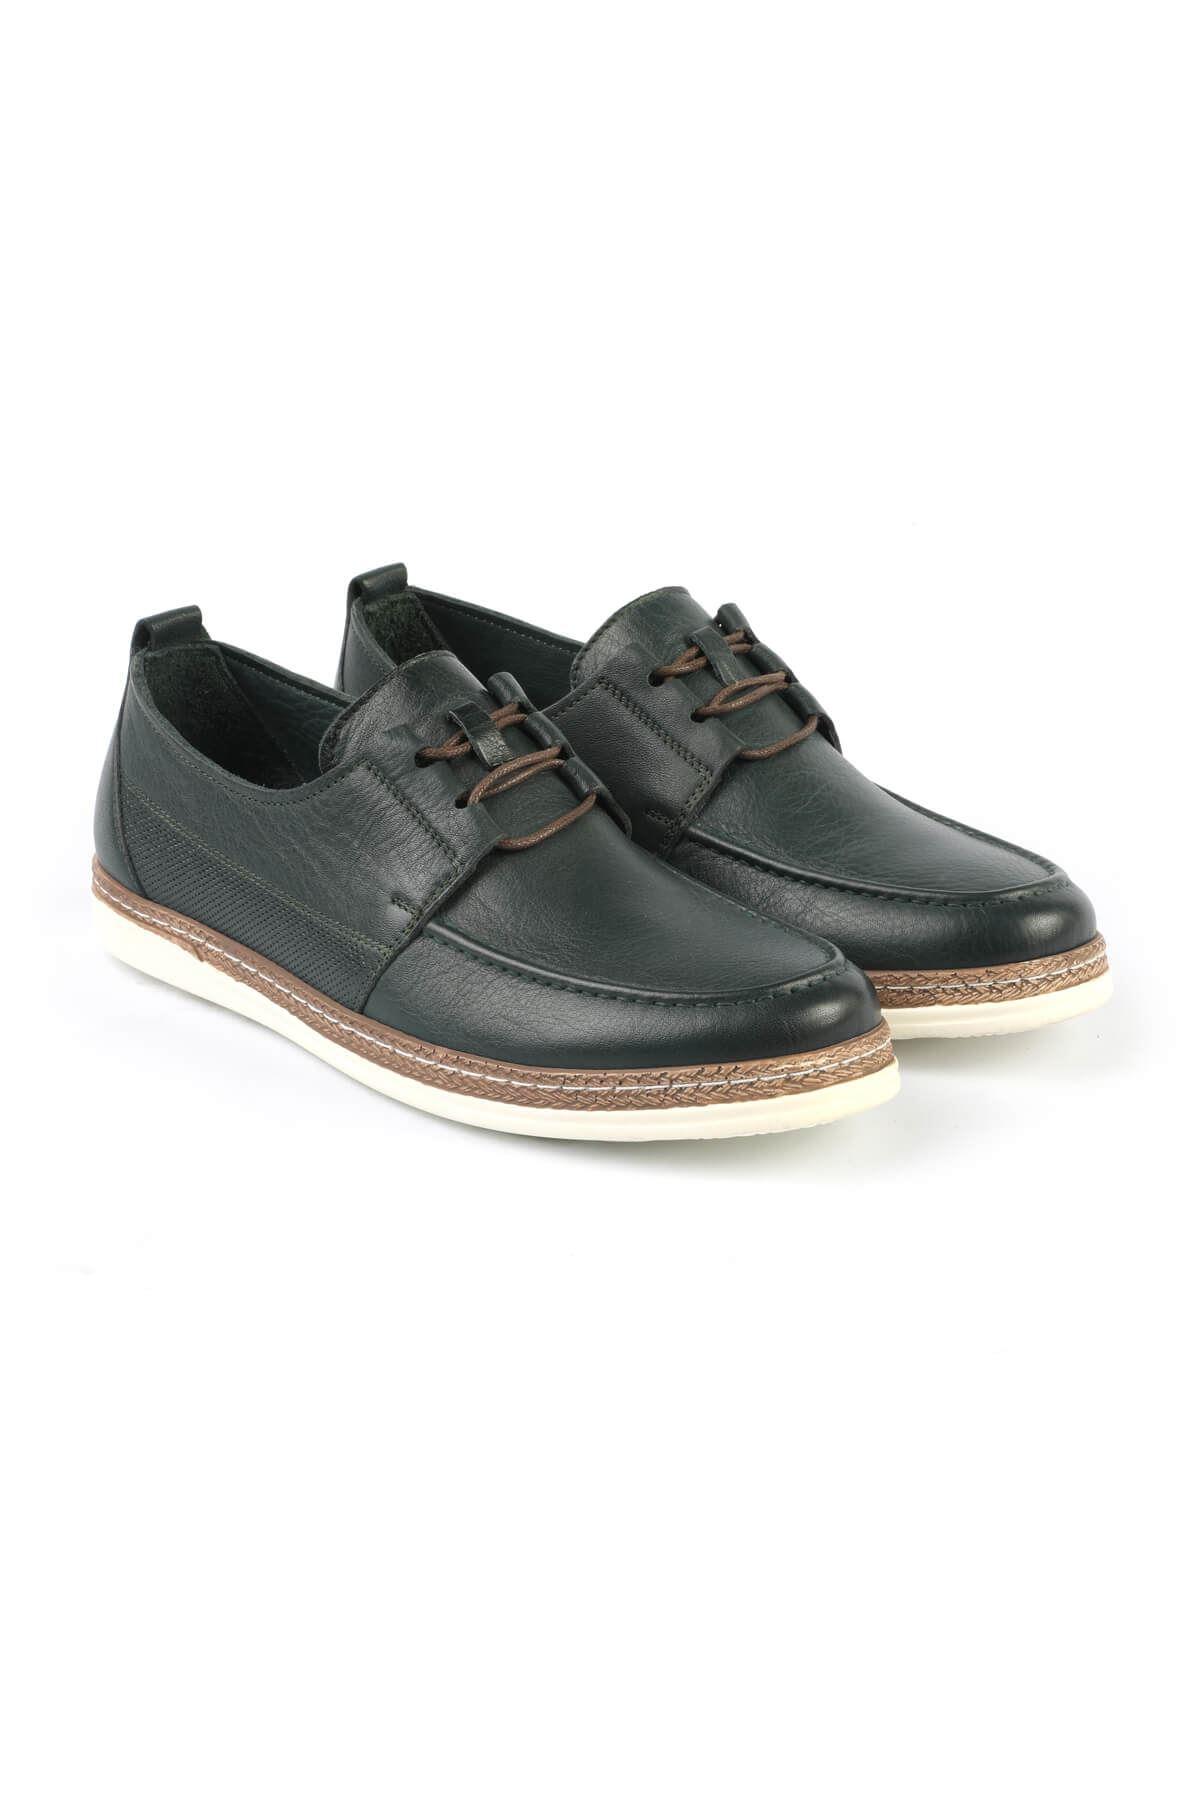 Libero C626 Green Casual Shoes